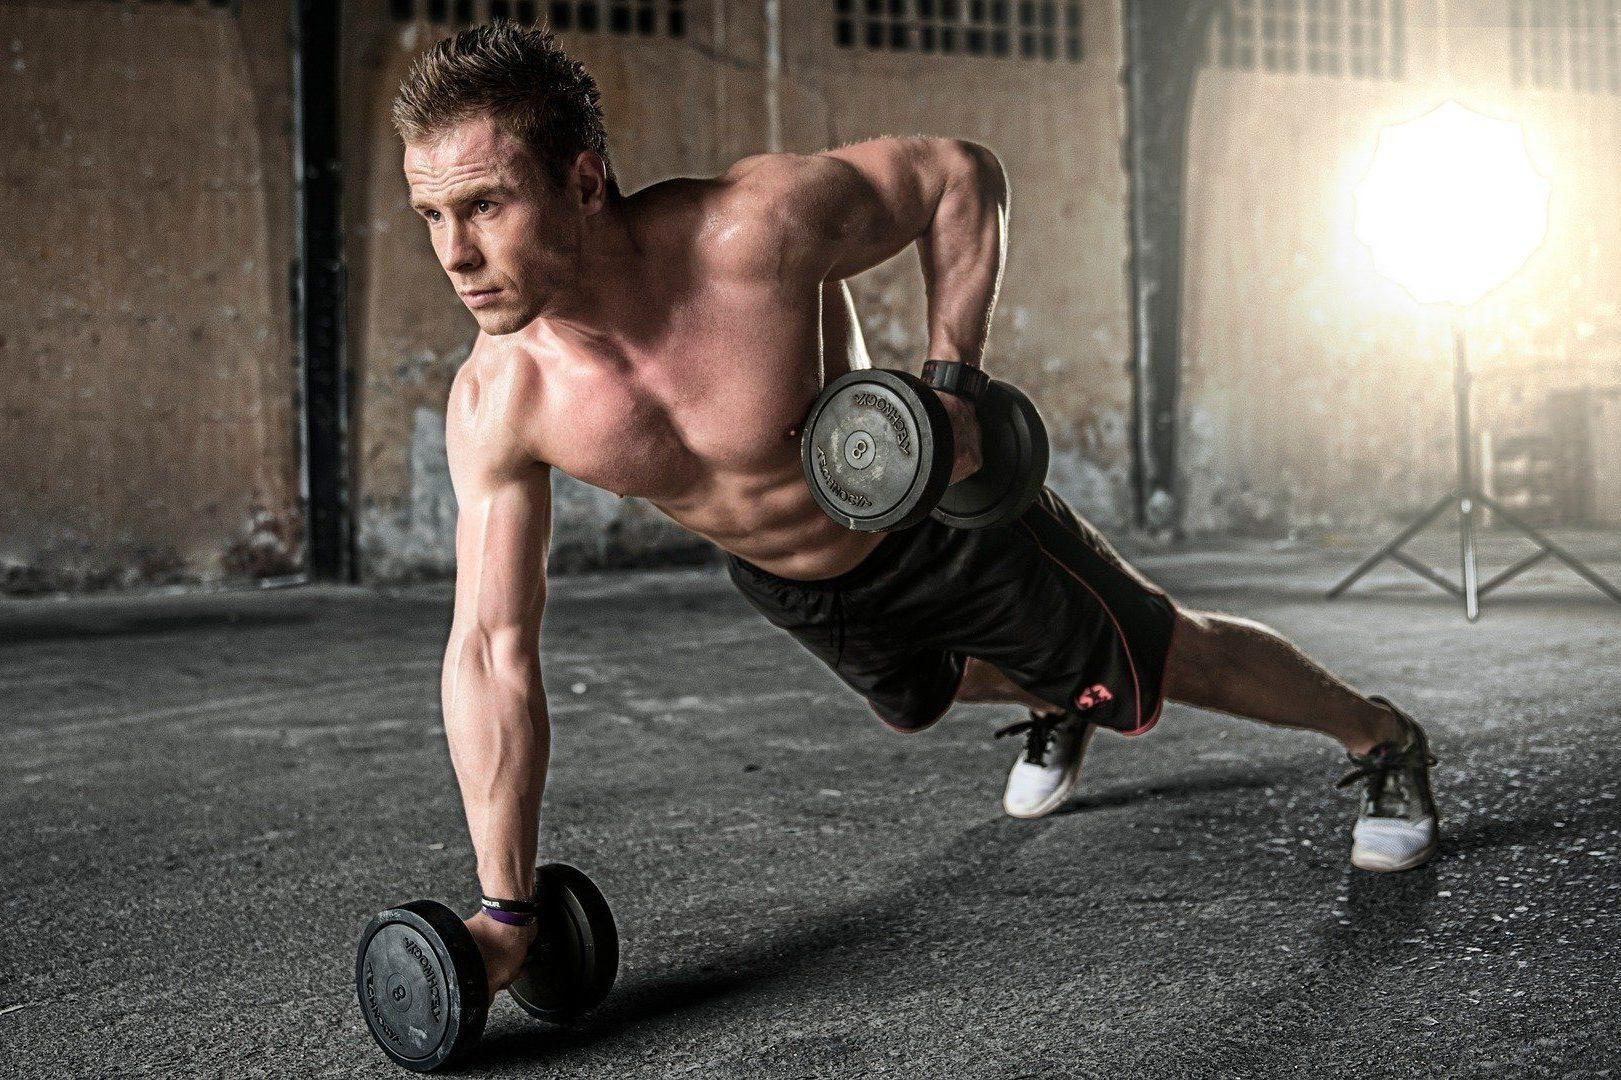 esercizio fitness e pesi 2 manubri in neoprene per casa colore rosa 1 kg Anjing palestra